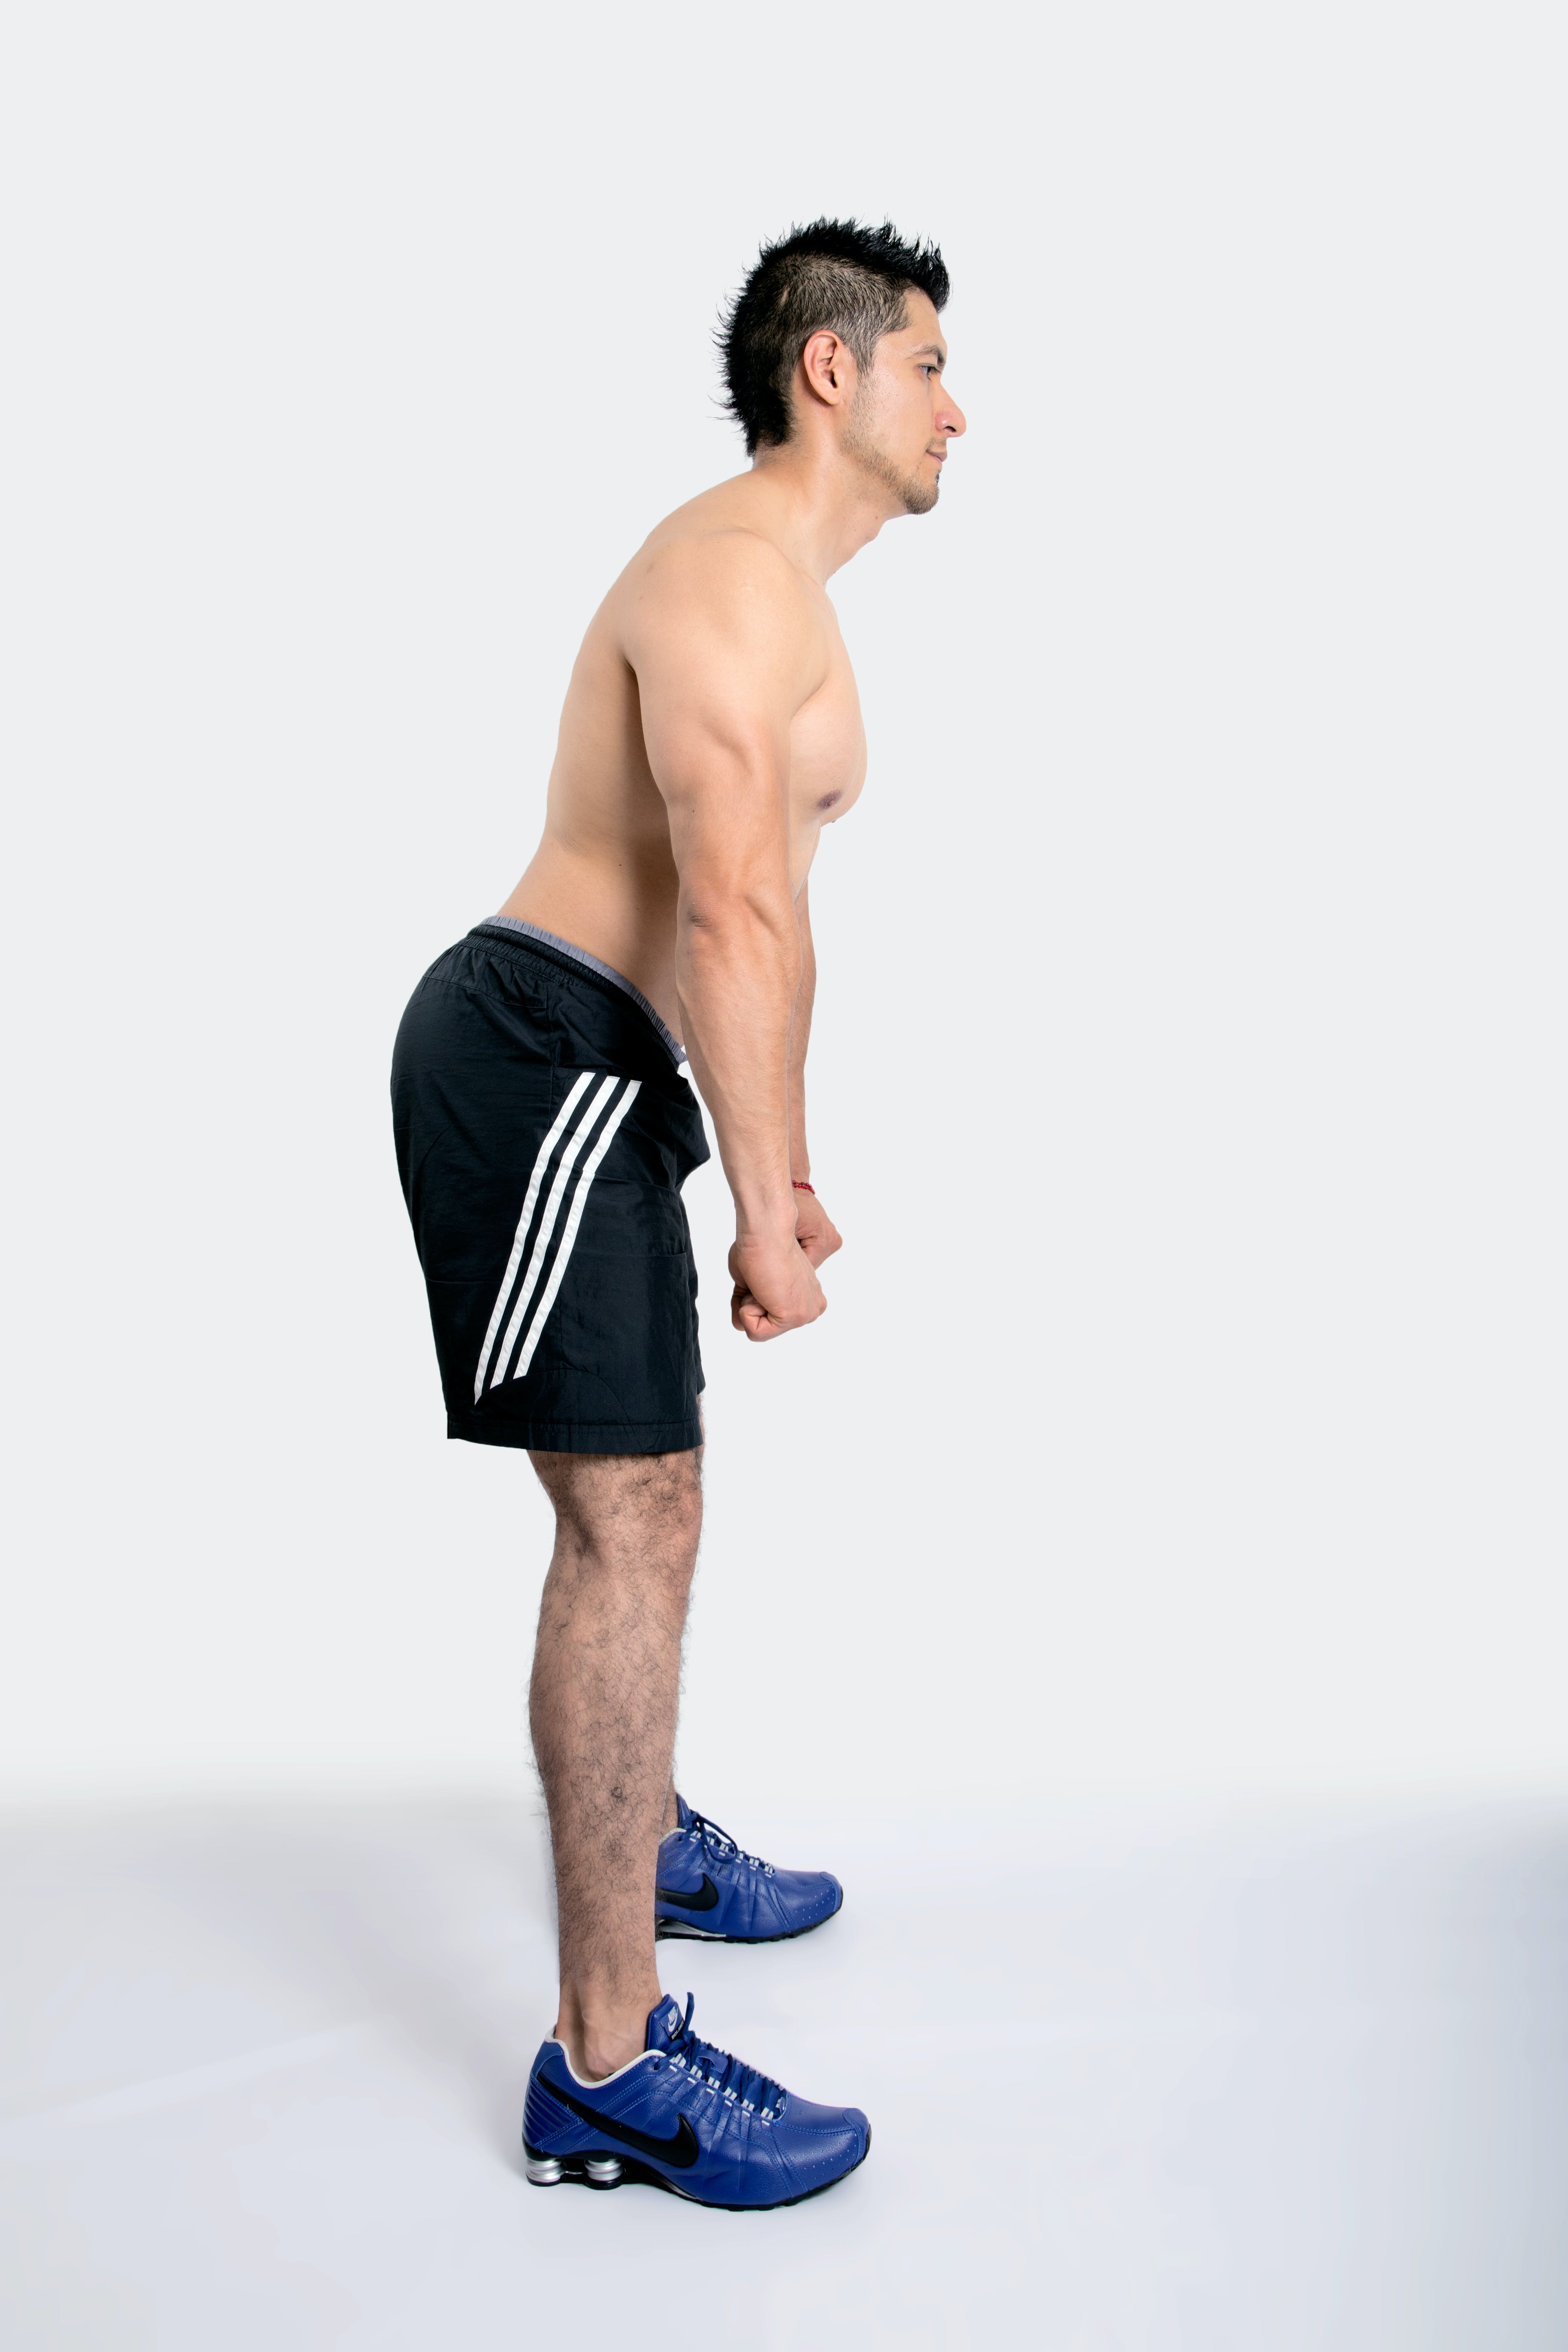 Kostenloses Stock Foto zu fitness